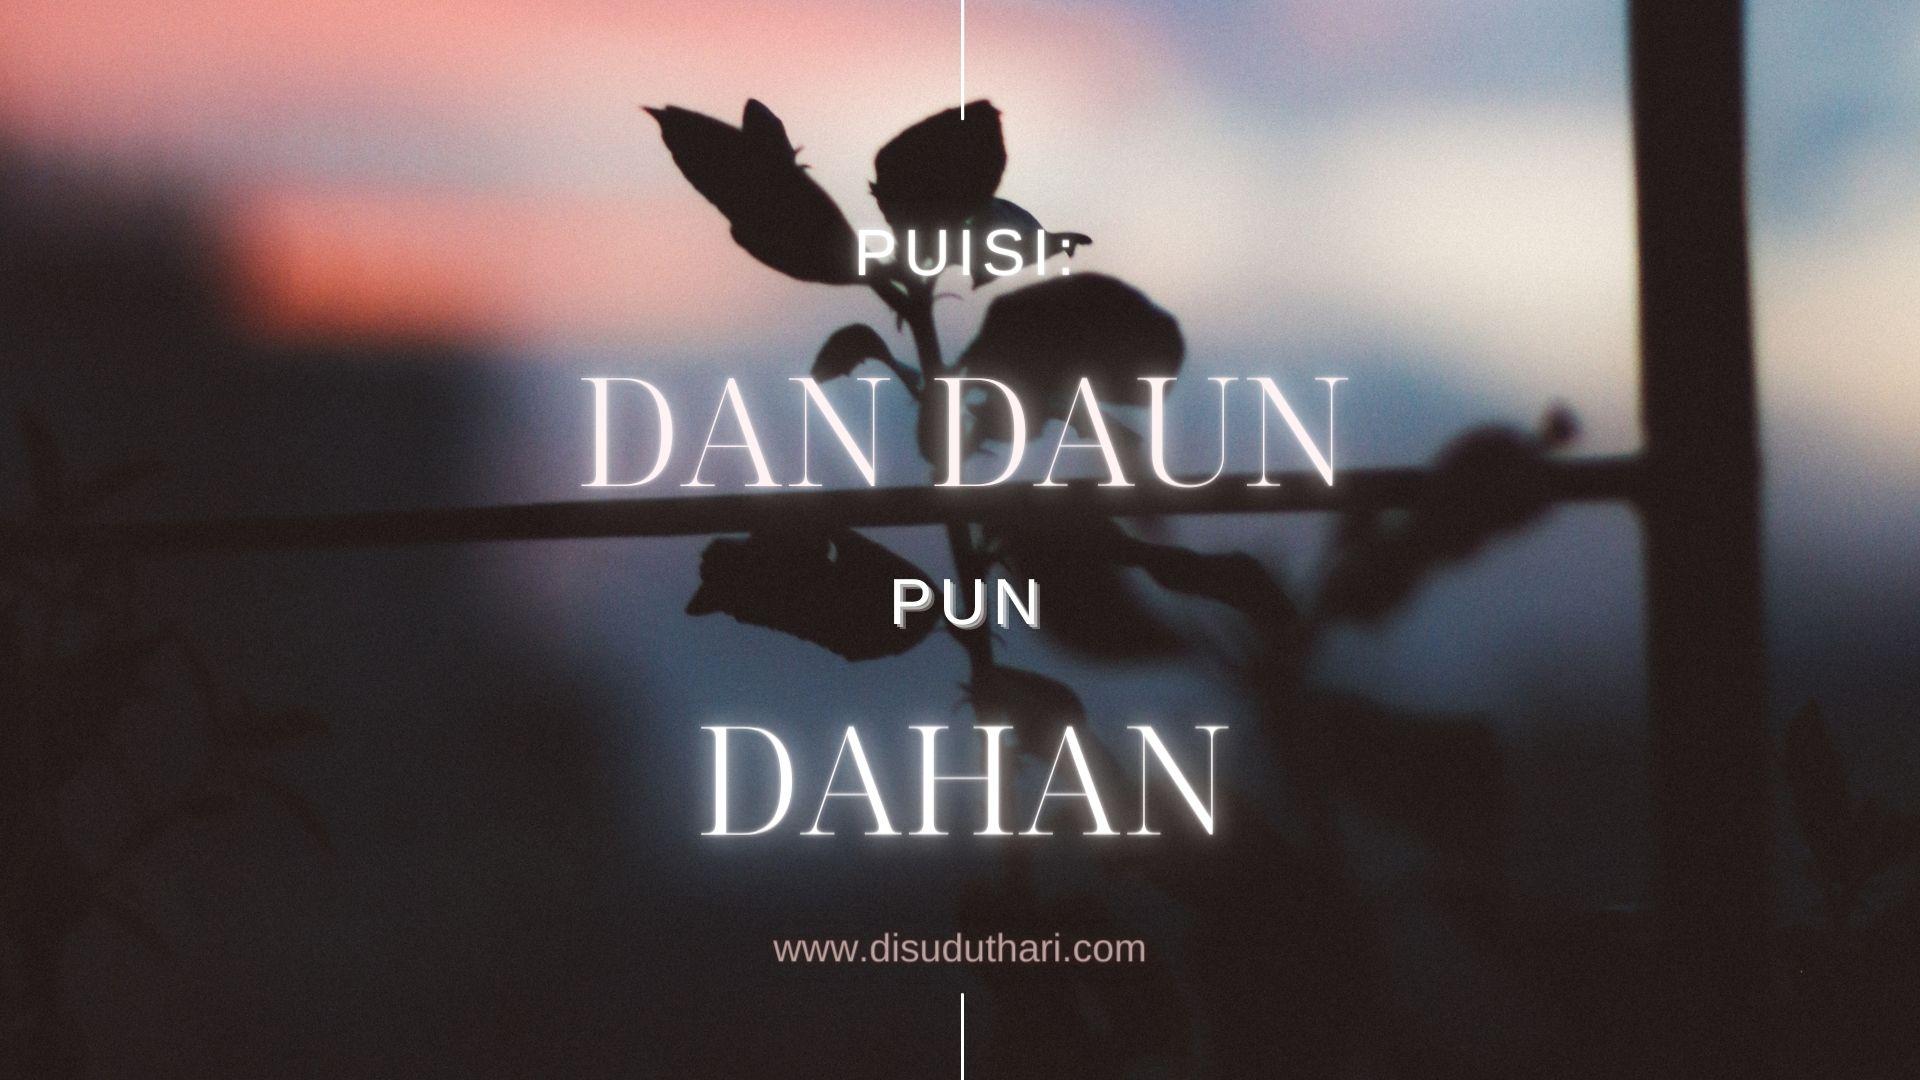 Puisi Berjudul Dan Daun pun Dahan